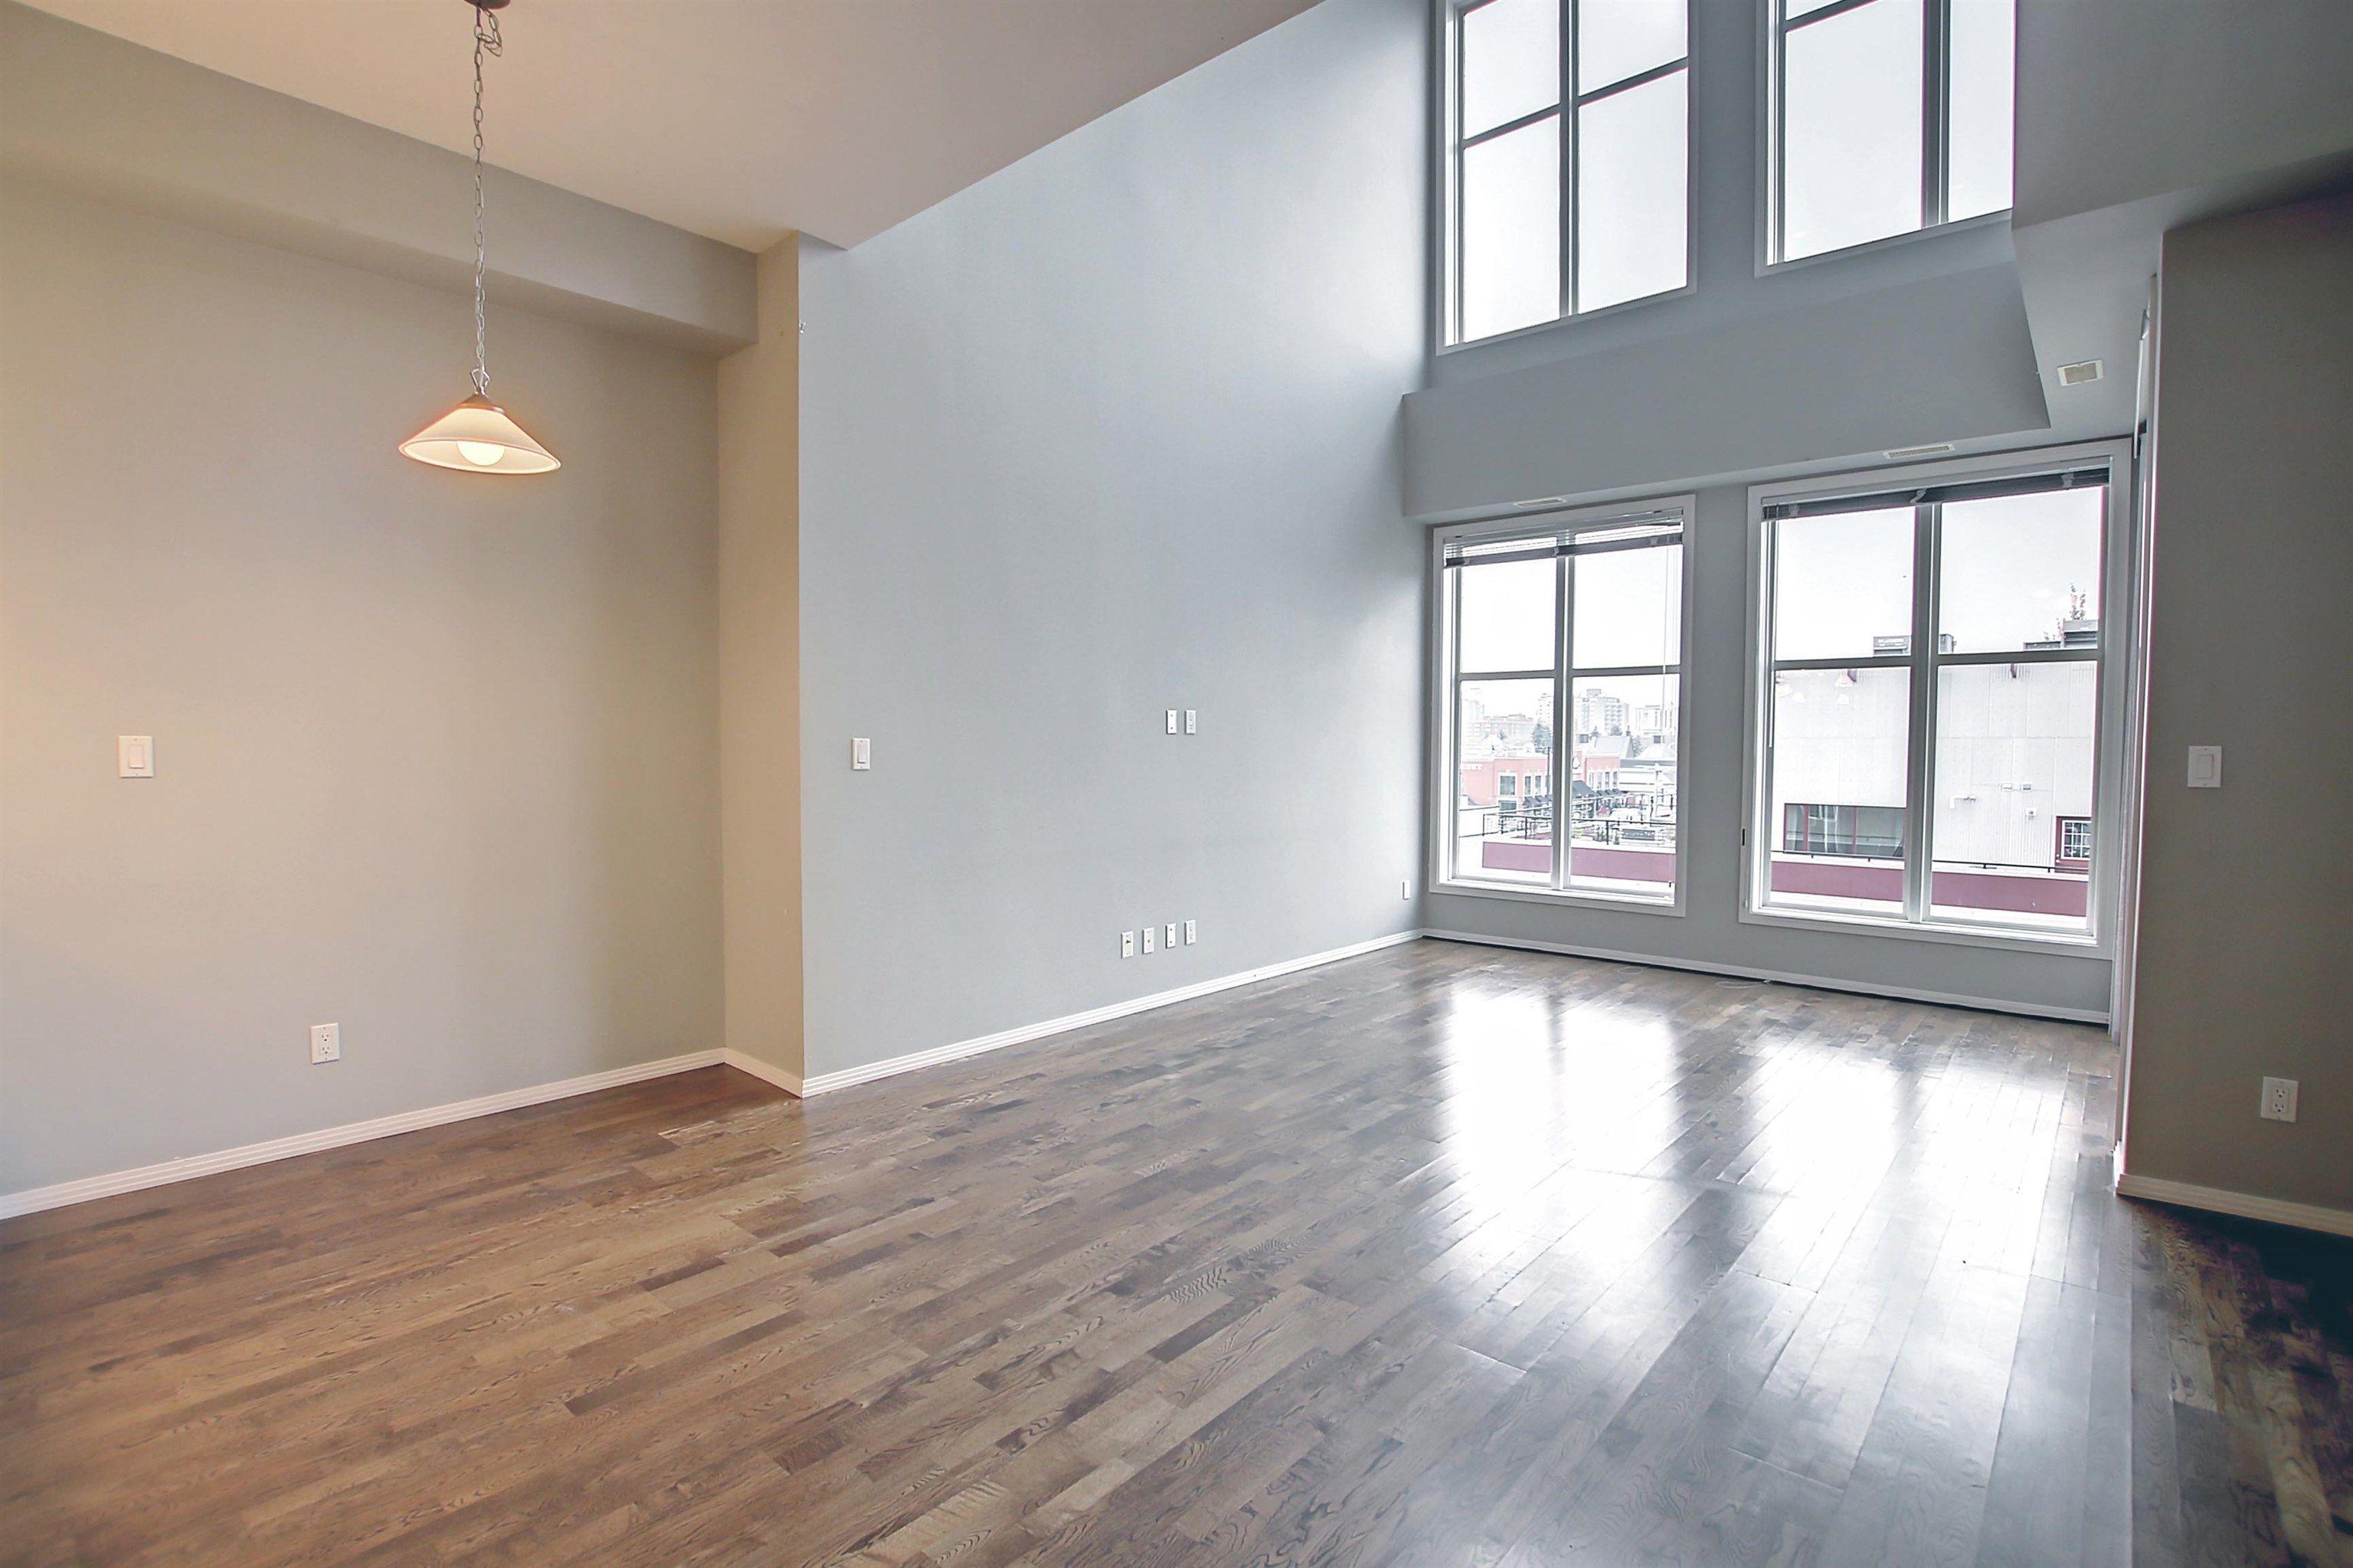 Main Photo: 407 10531 117 Street NW in Edmonton: Zone 08 Condo for sale : MLS®# E4265606